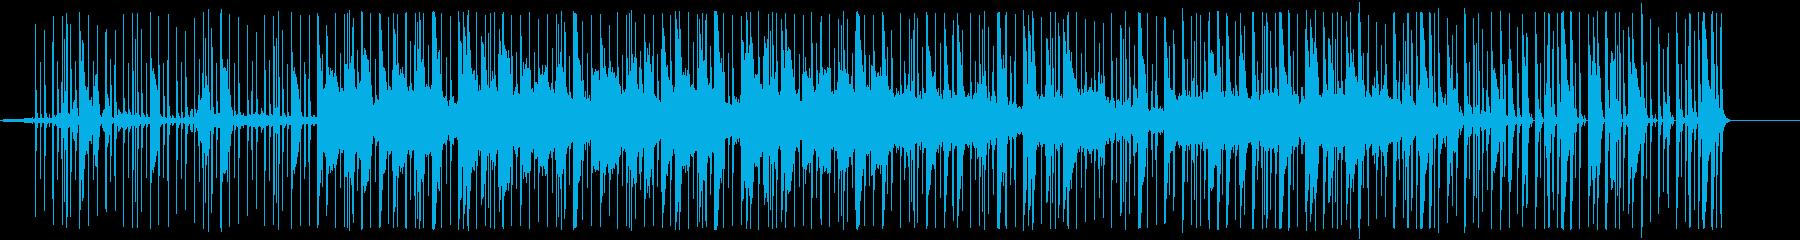 Morning Bird の再生済みの波形